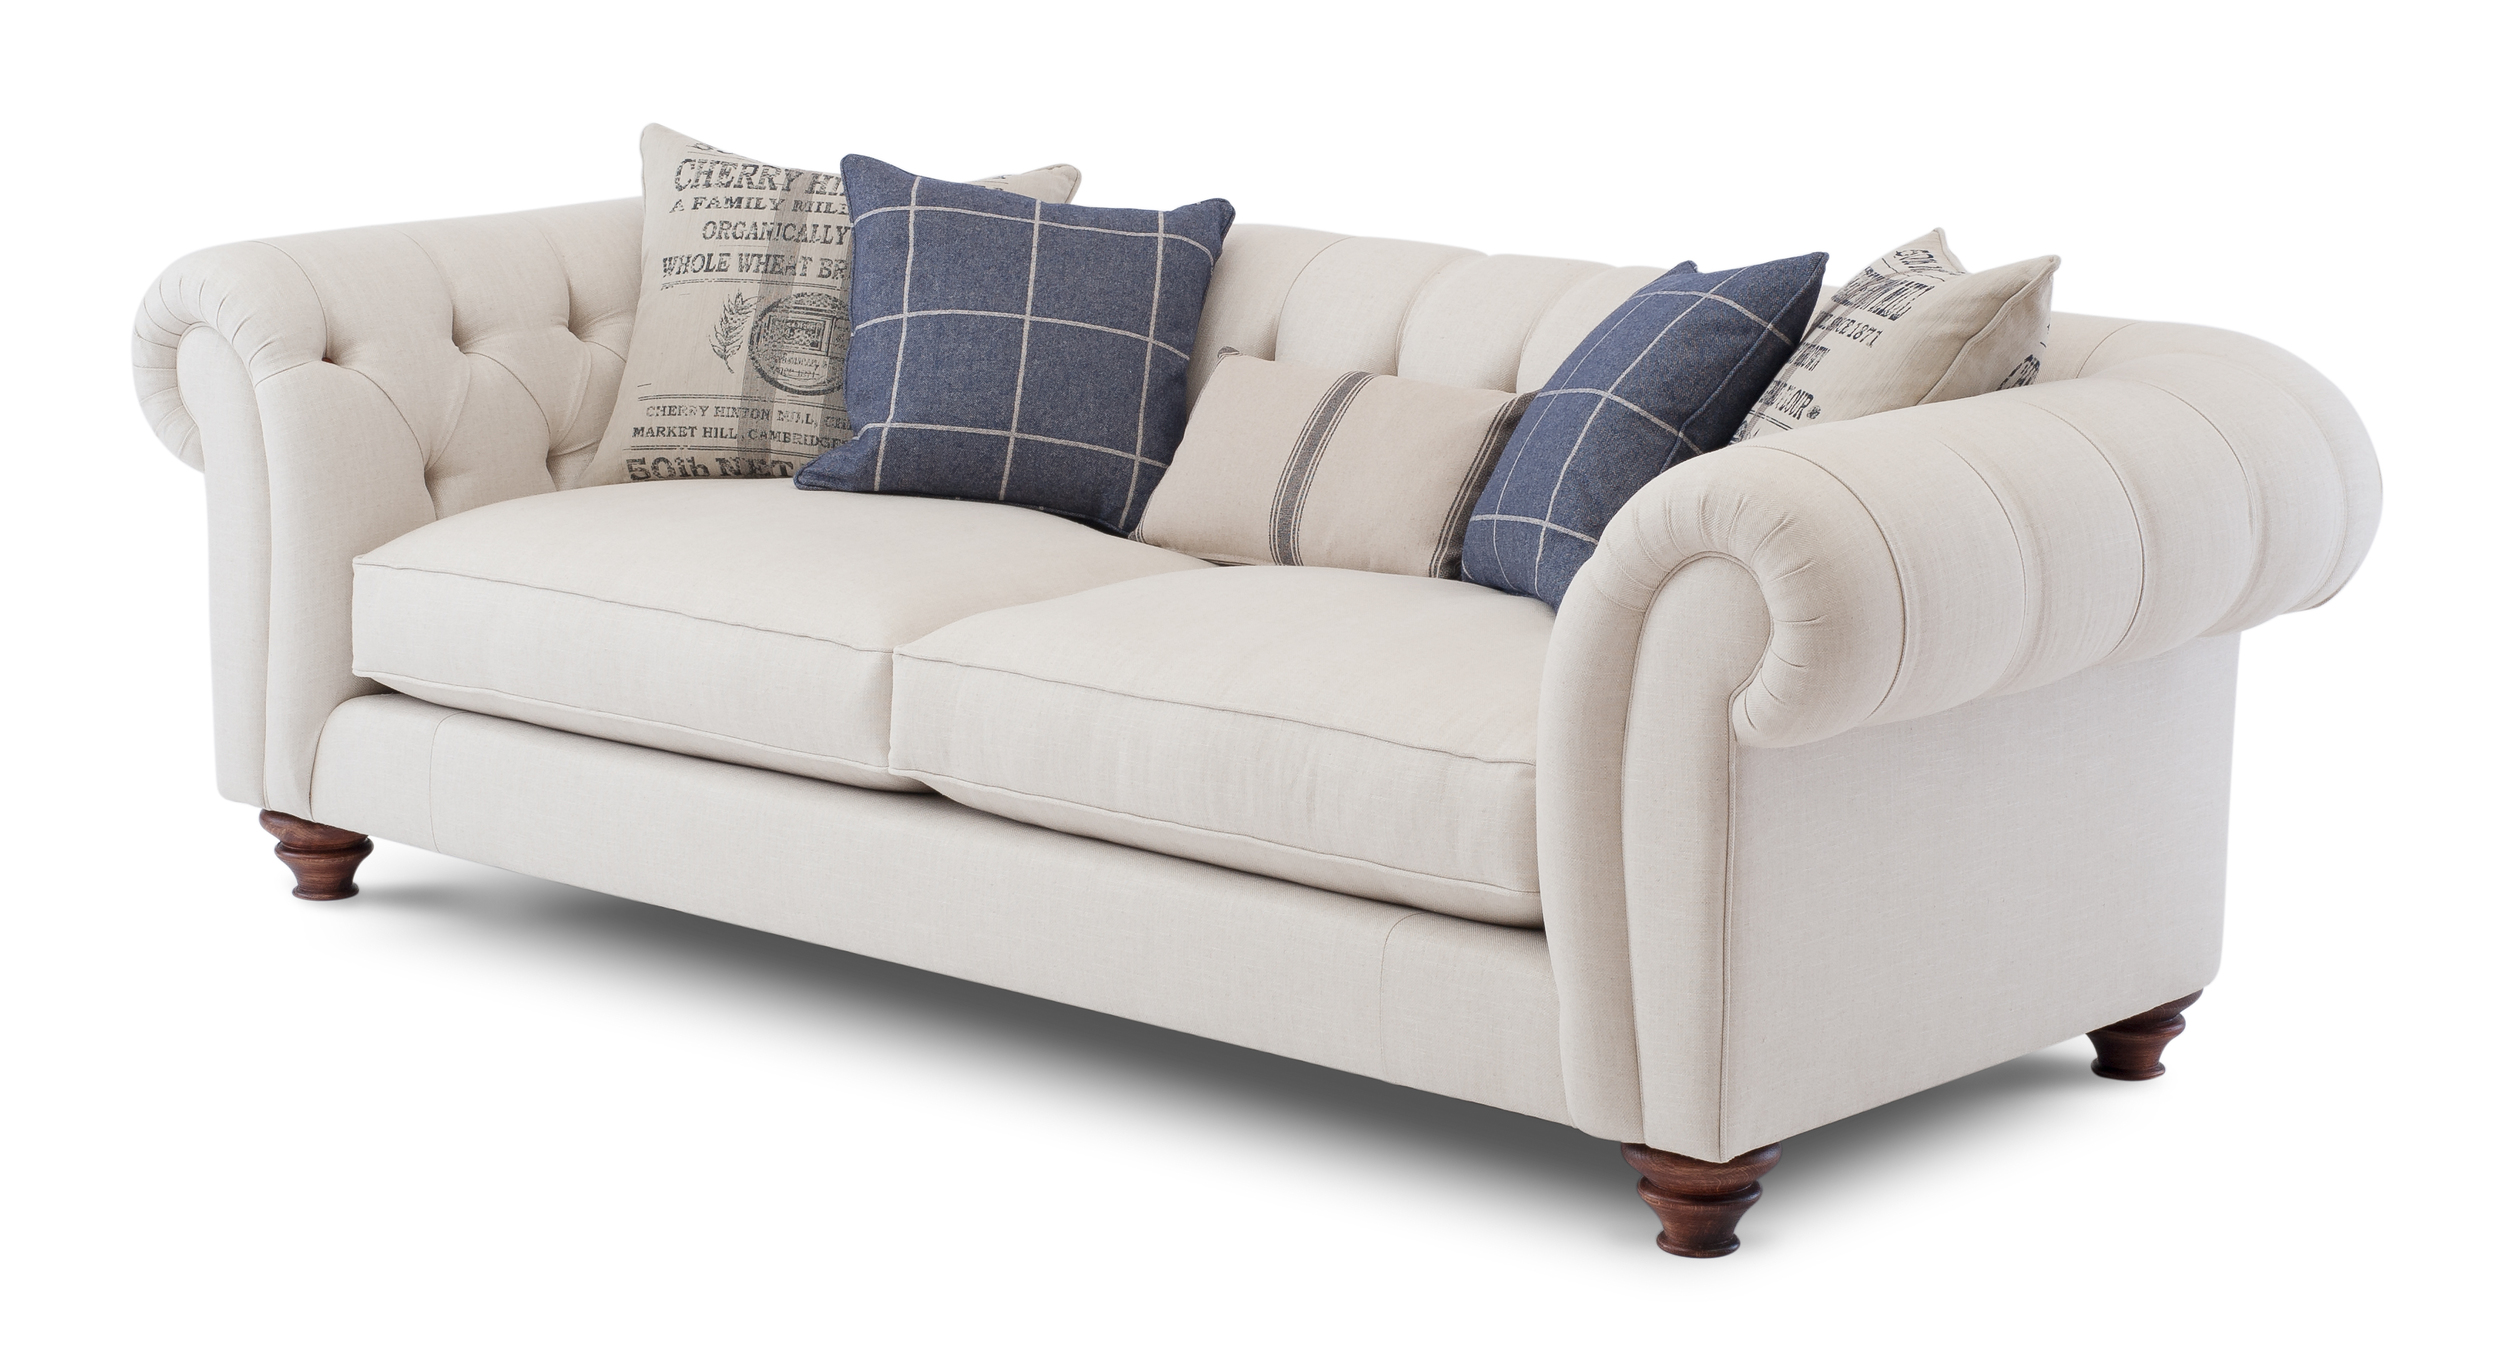 Churchill 4st sofa-145.jpg